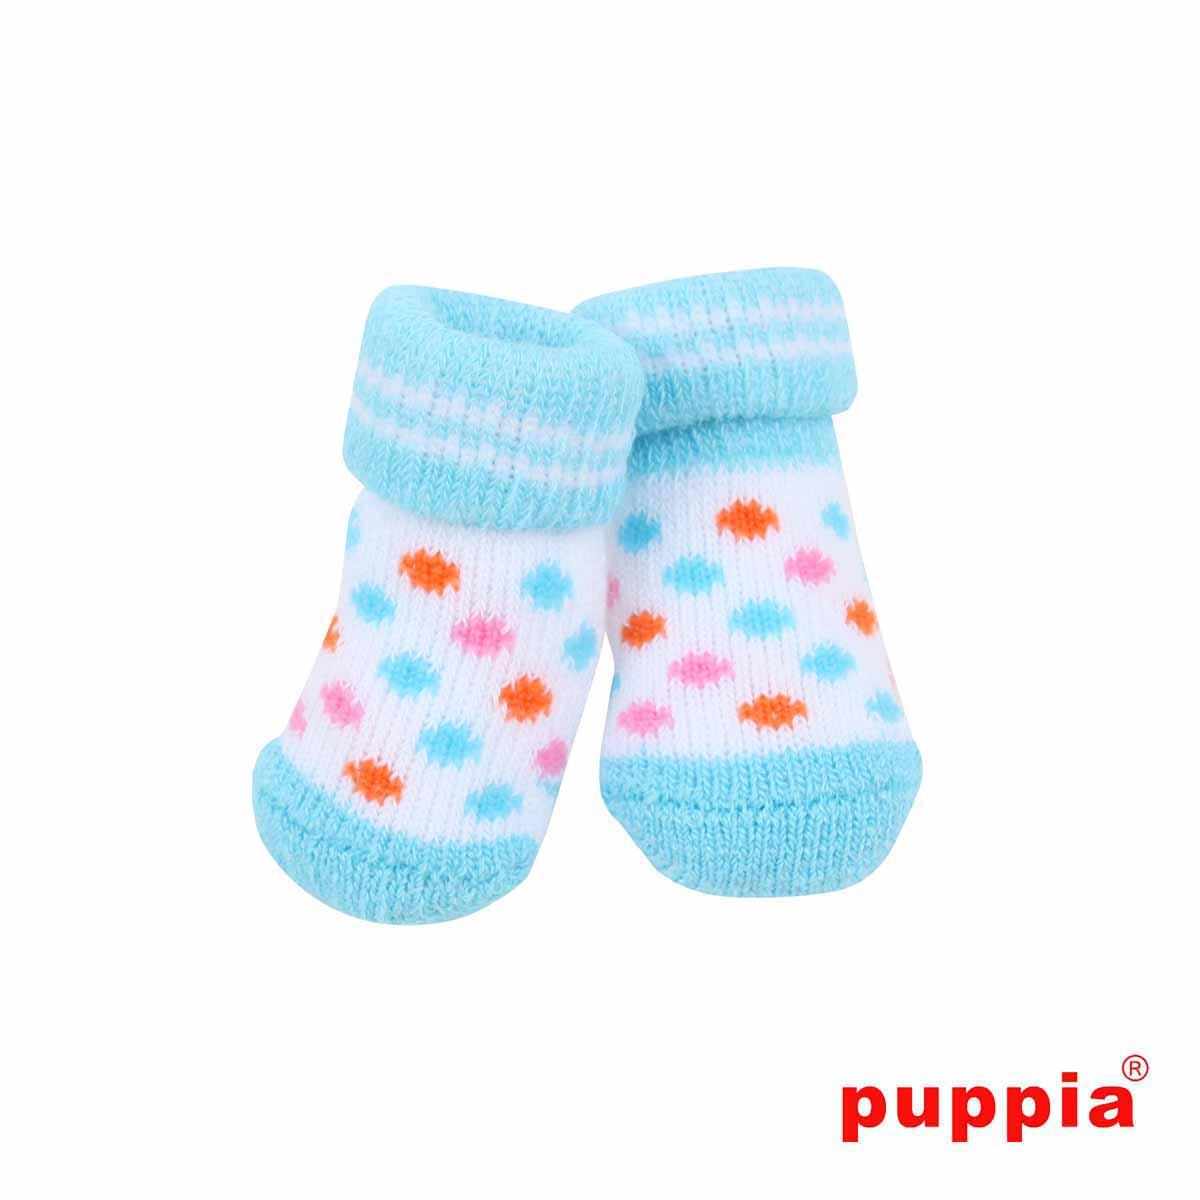 Polka Dot Dog Socks by Puppia - Sky Blue